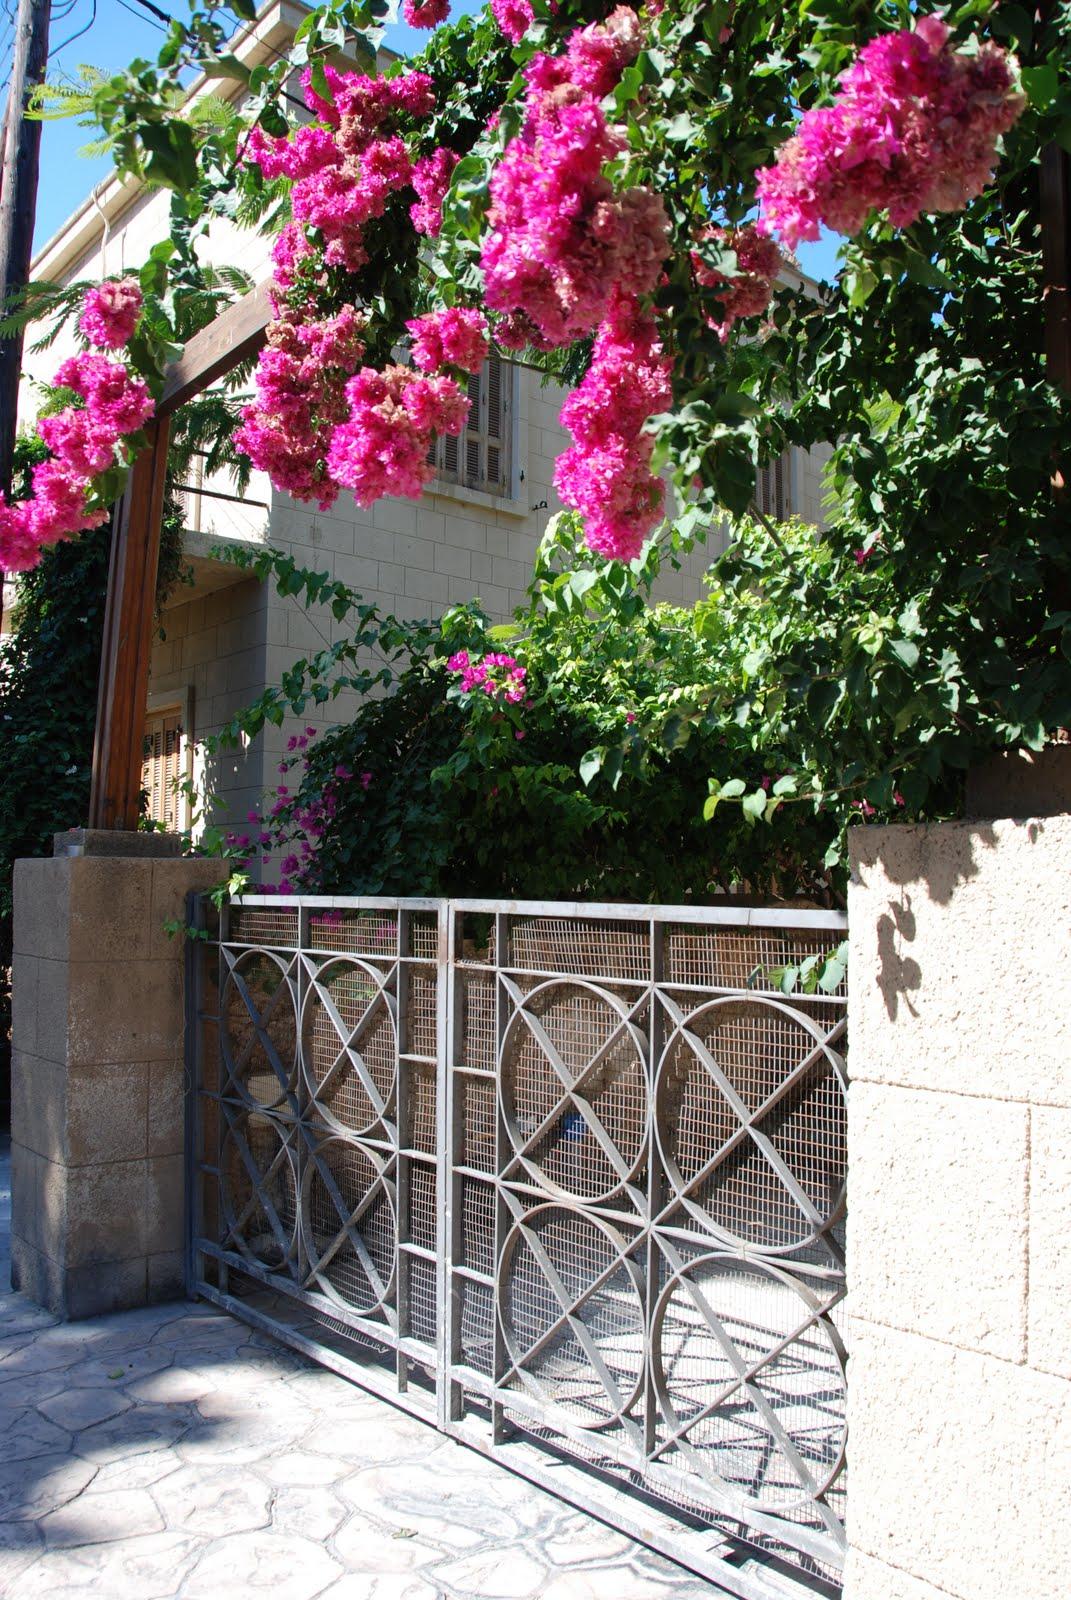 http://2.bp.blogspot.com/-EOCF_9g5ano/Tl9PBfAnRvI/AAAAAAAAAe4/v8N-0ycHN_M/s1600/DSC_0493.jpg